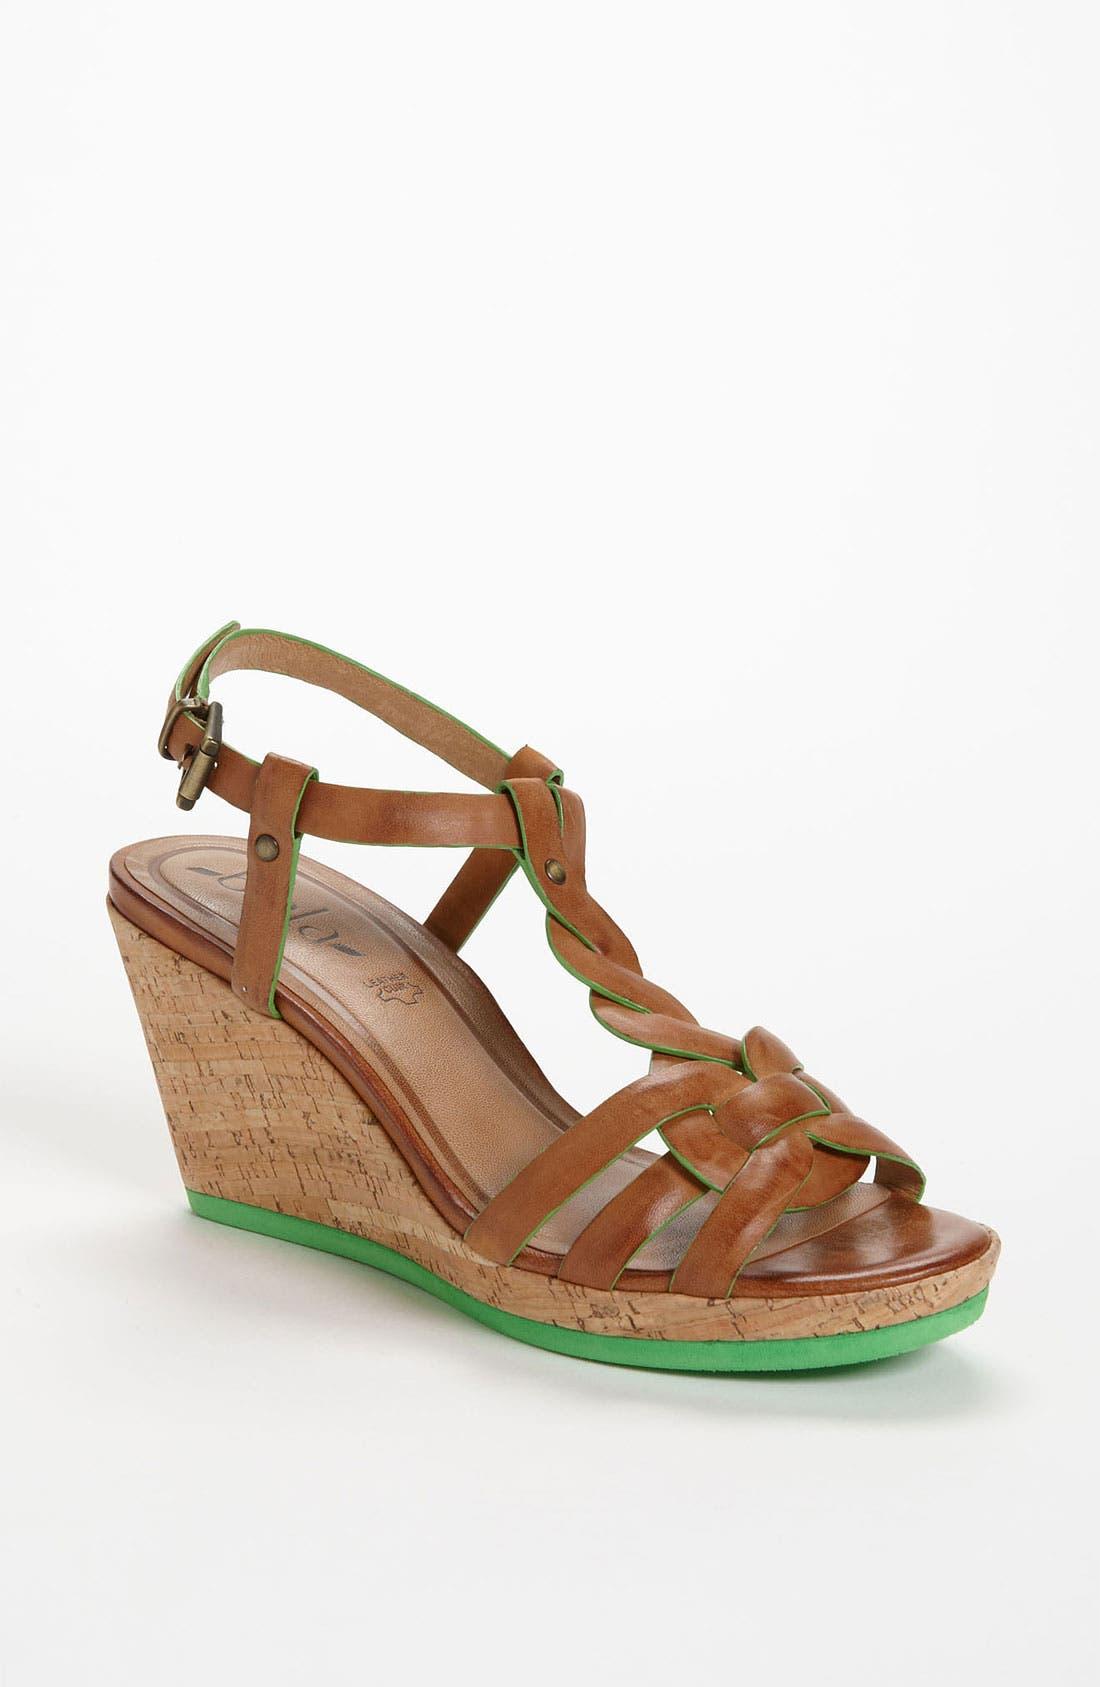 Main Image - Biala 'Jillian' Wedge Sandal